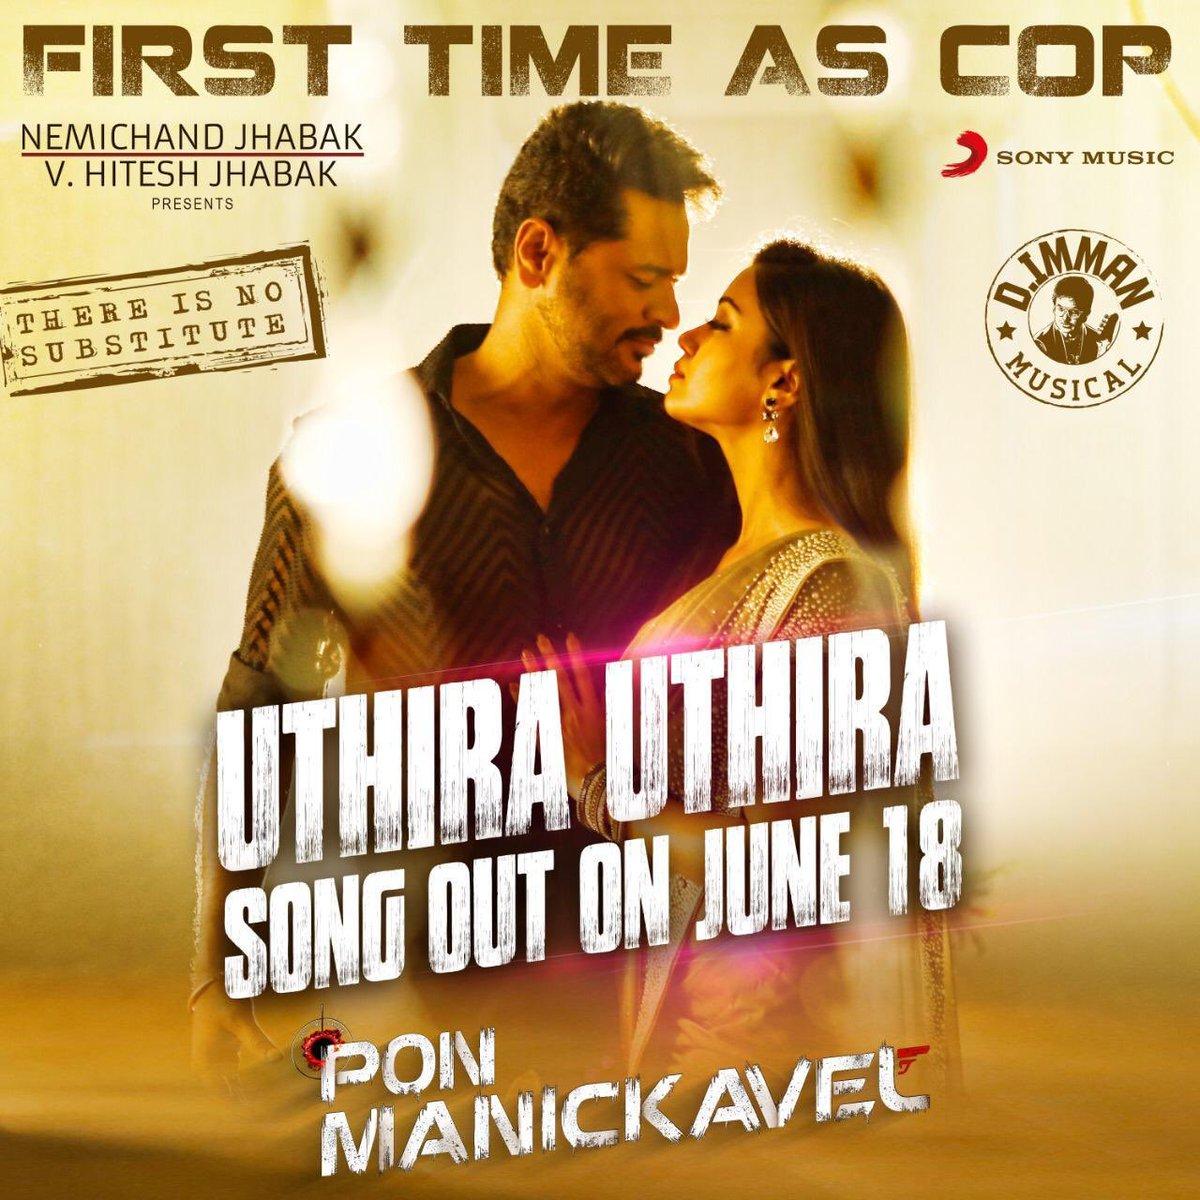 prabhu deva new movie songprabhu deva songs, prabhu deva new song, prabhu deva dance, prabhu deva new movie, prabhu deva movies, prabhu deva hits, prabhu deva age, prabhu deva new movie song, prabhu deva latest song, prabhu deva movie songs, prabhu deva video songs, prabhu deva movie list, prabhu deva tamil movies, prabhu deva songs download, prabhu deva new film, prabhu deva dance video, prabhu deva films, prabhu deva brother, prabhu deva dance song, prabhu deva wiki